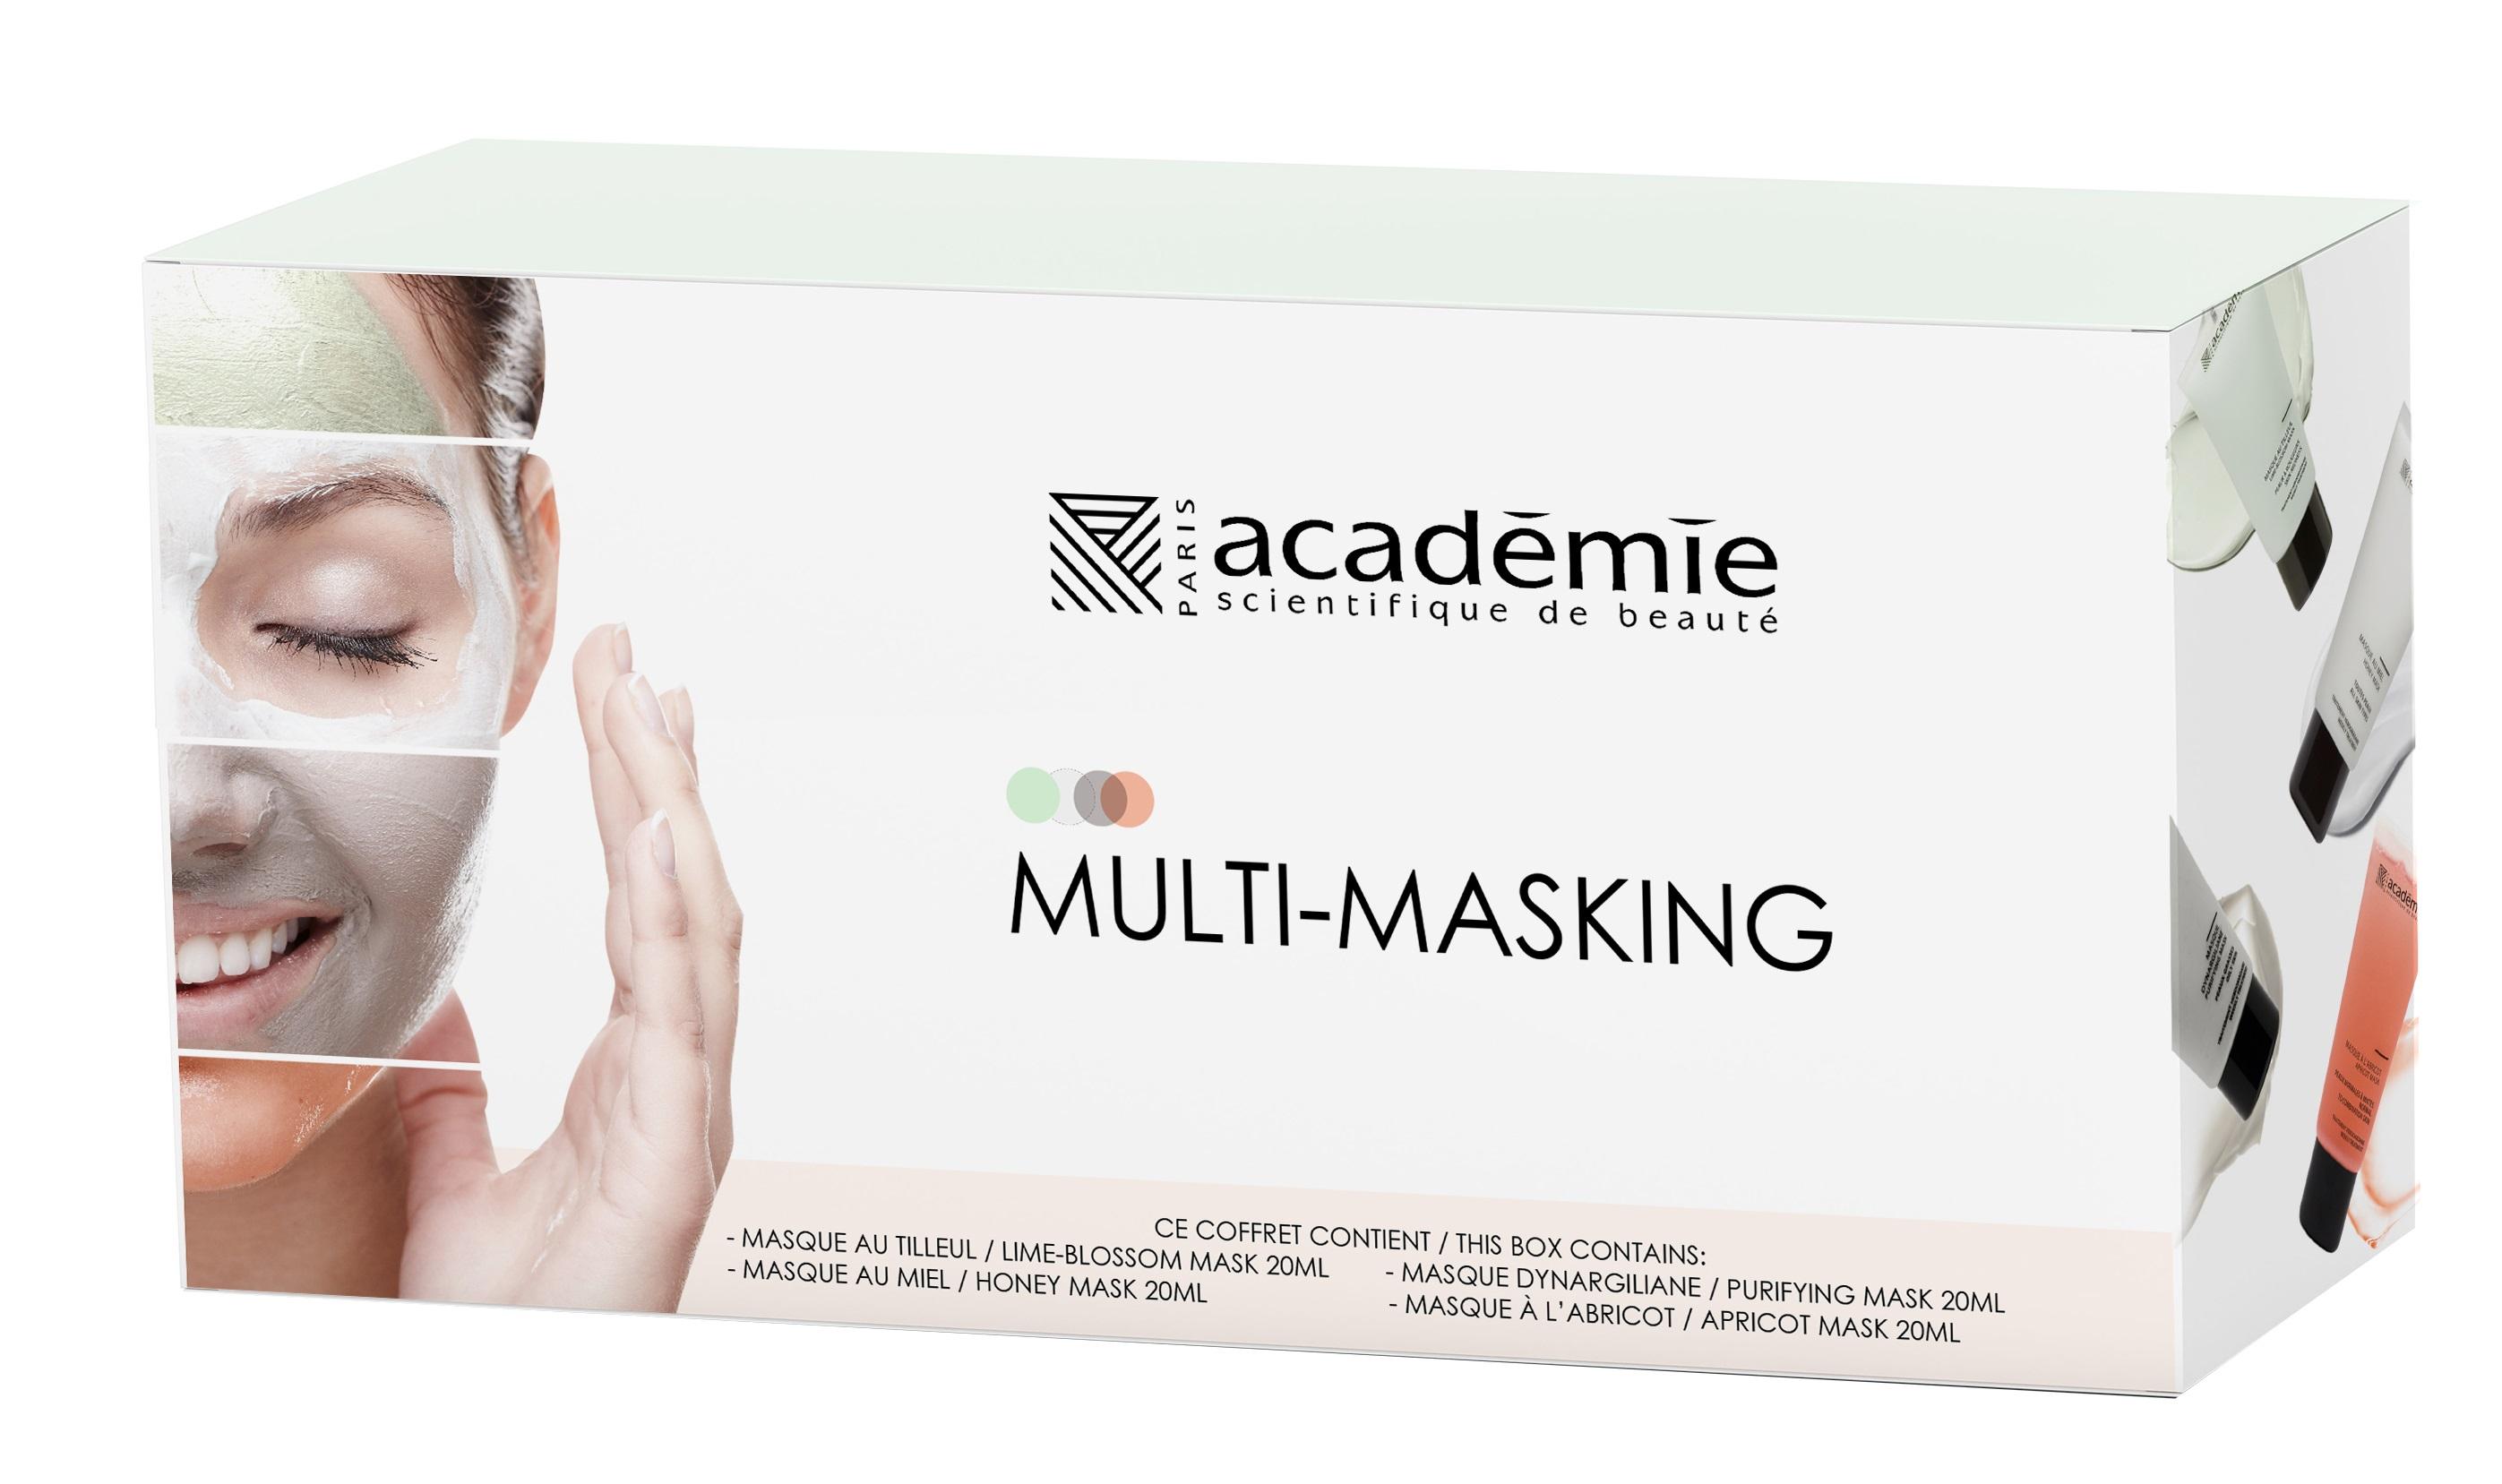 ACADEMIE Набор масок для лица Мультимаскинг (абрикосовая маска 20 мл, глиняная маска 20 мл, медовая маска 20 мл, липовая маска 20 мл) / Visage